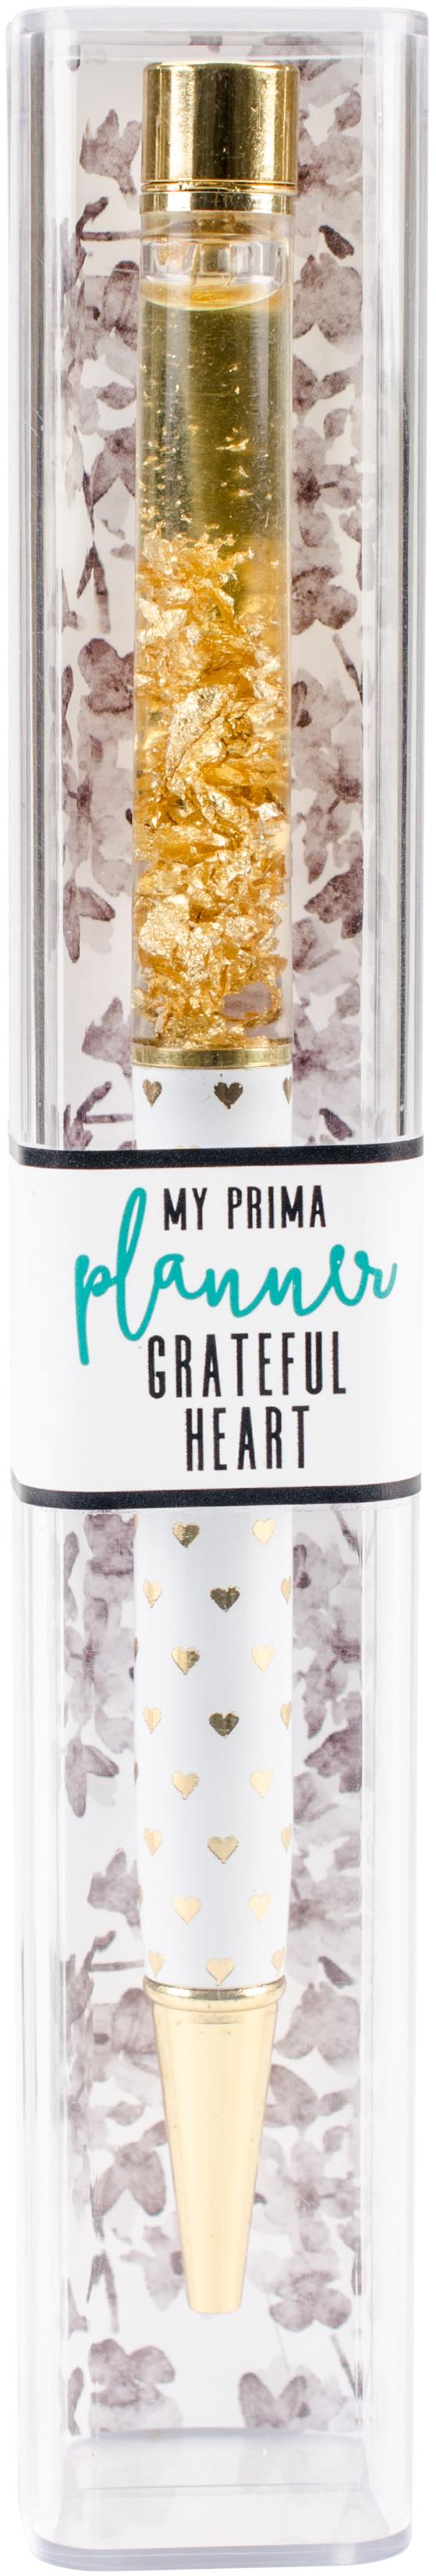 Prima Planner Grateful Heart